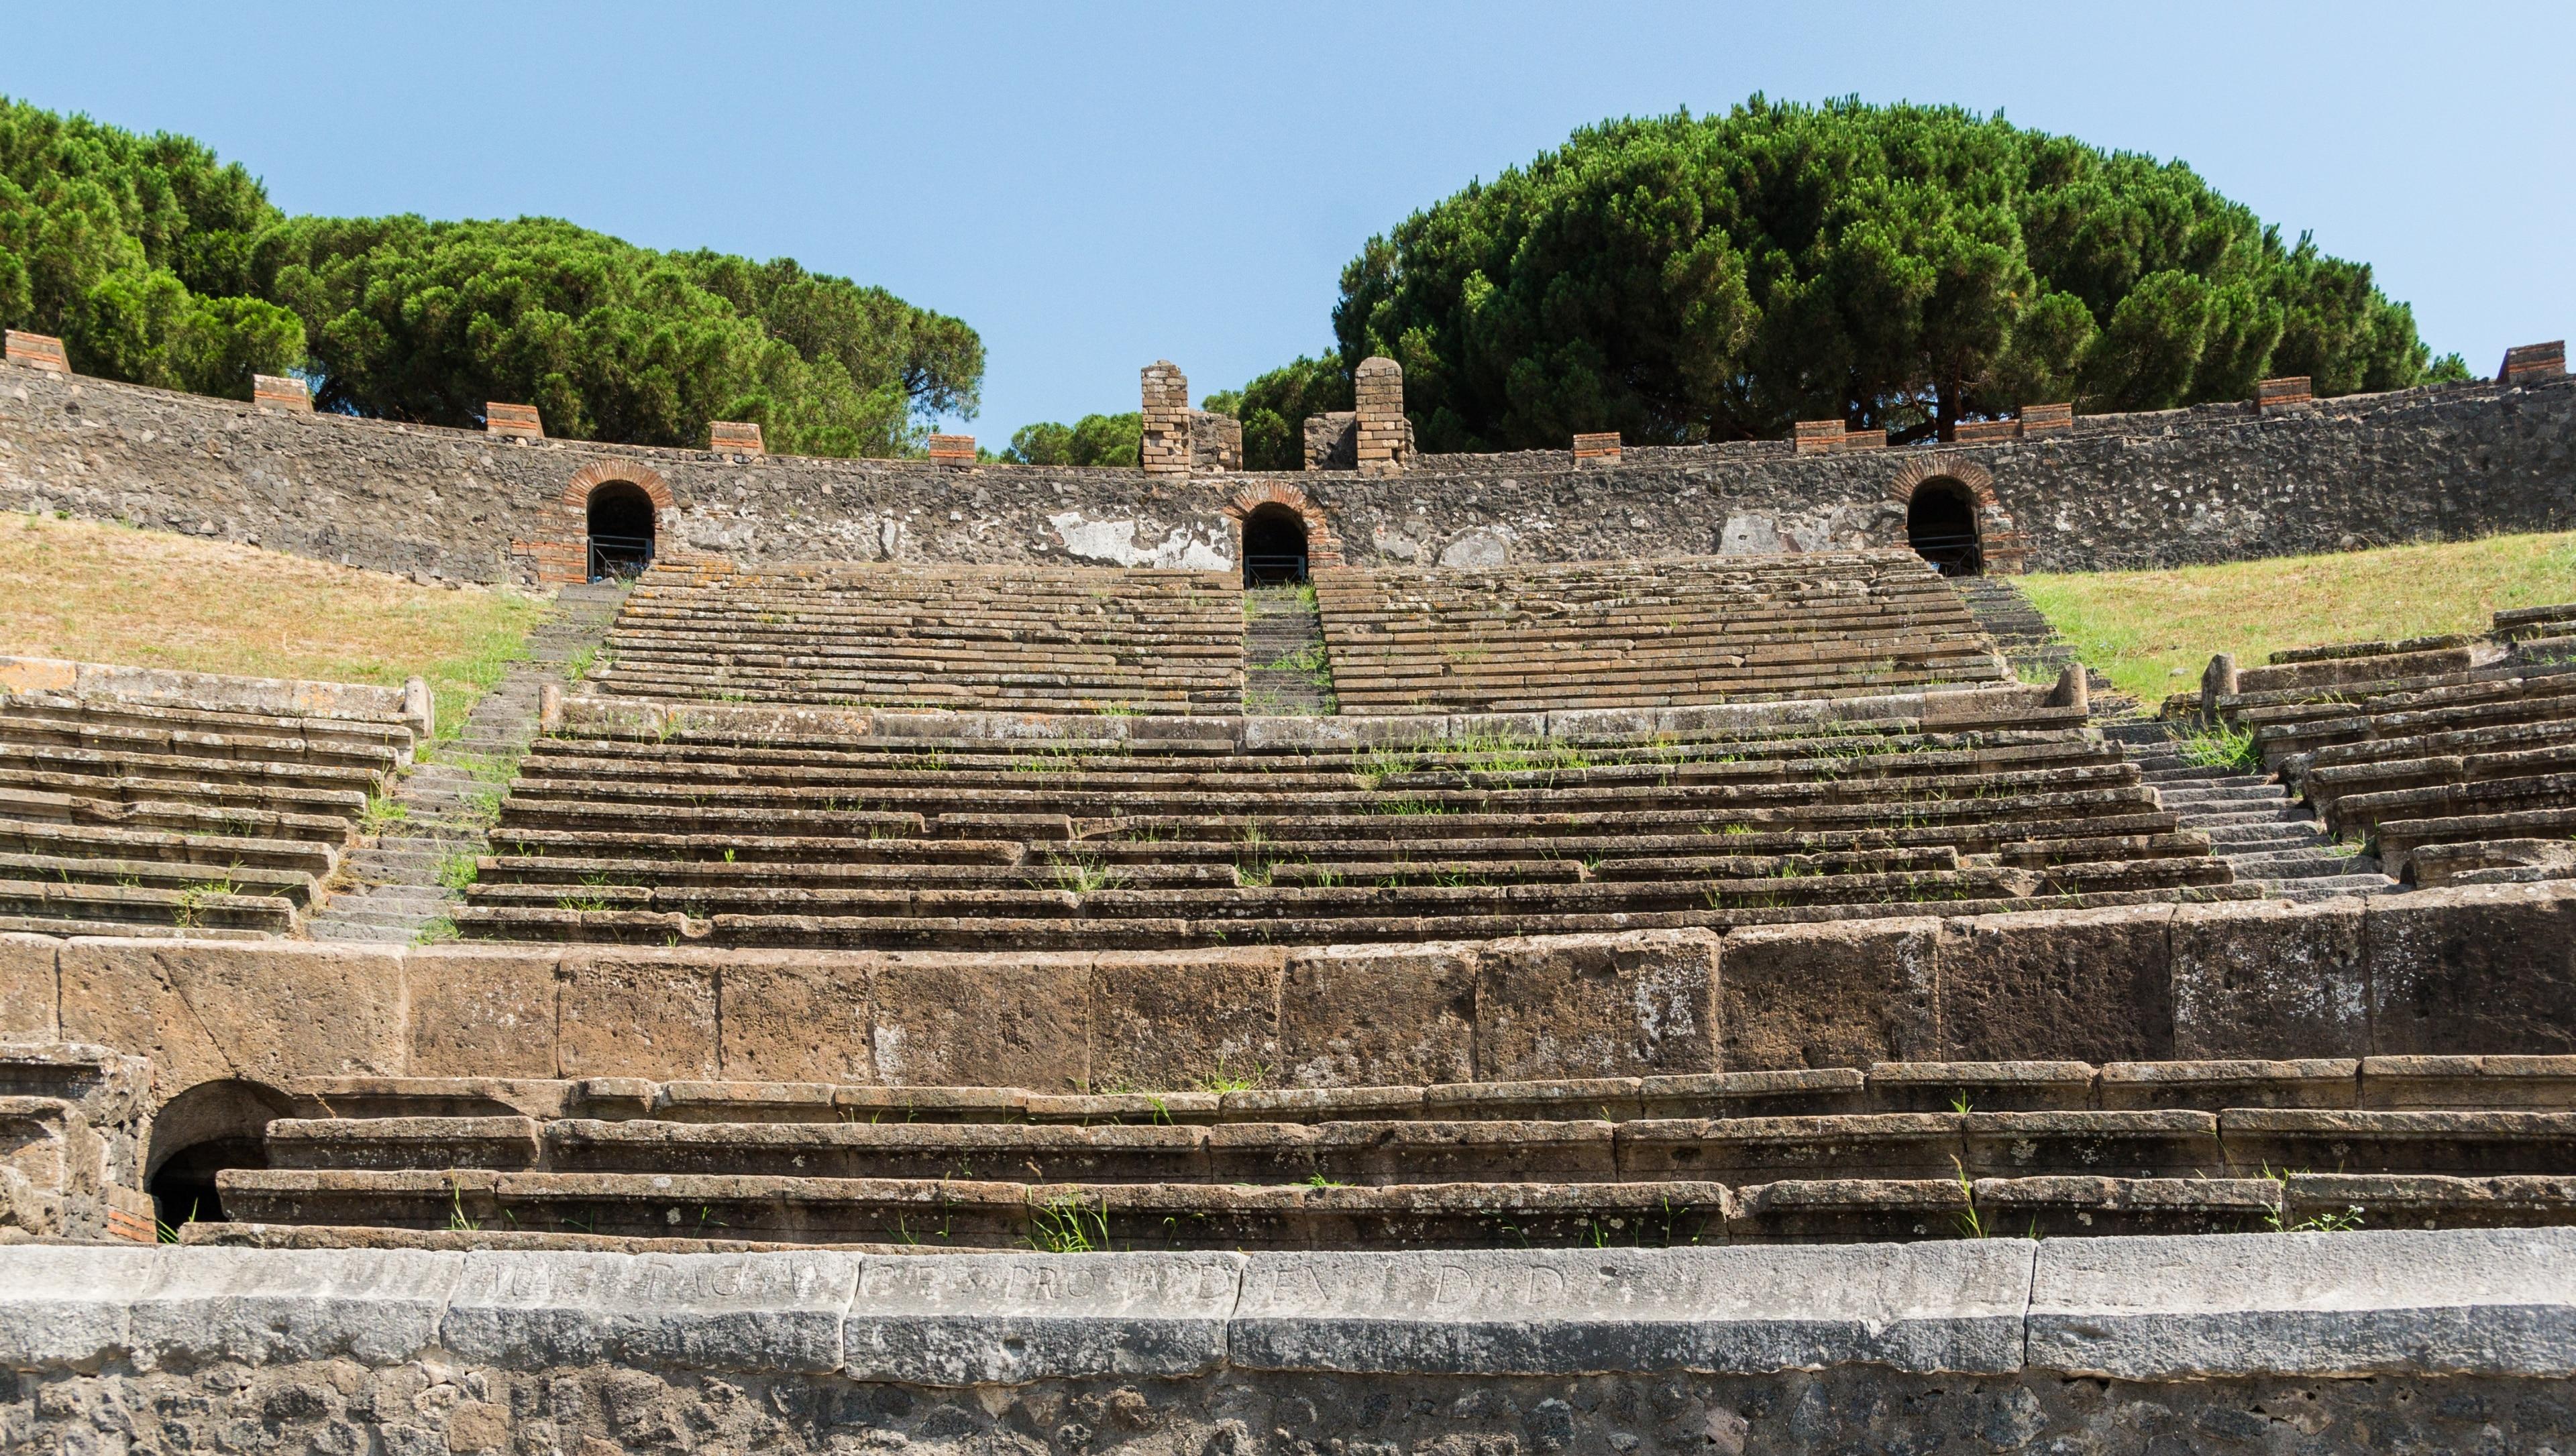 Amphitheater von Pompeji, Pompei, Kampanien, Italien